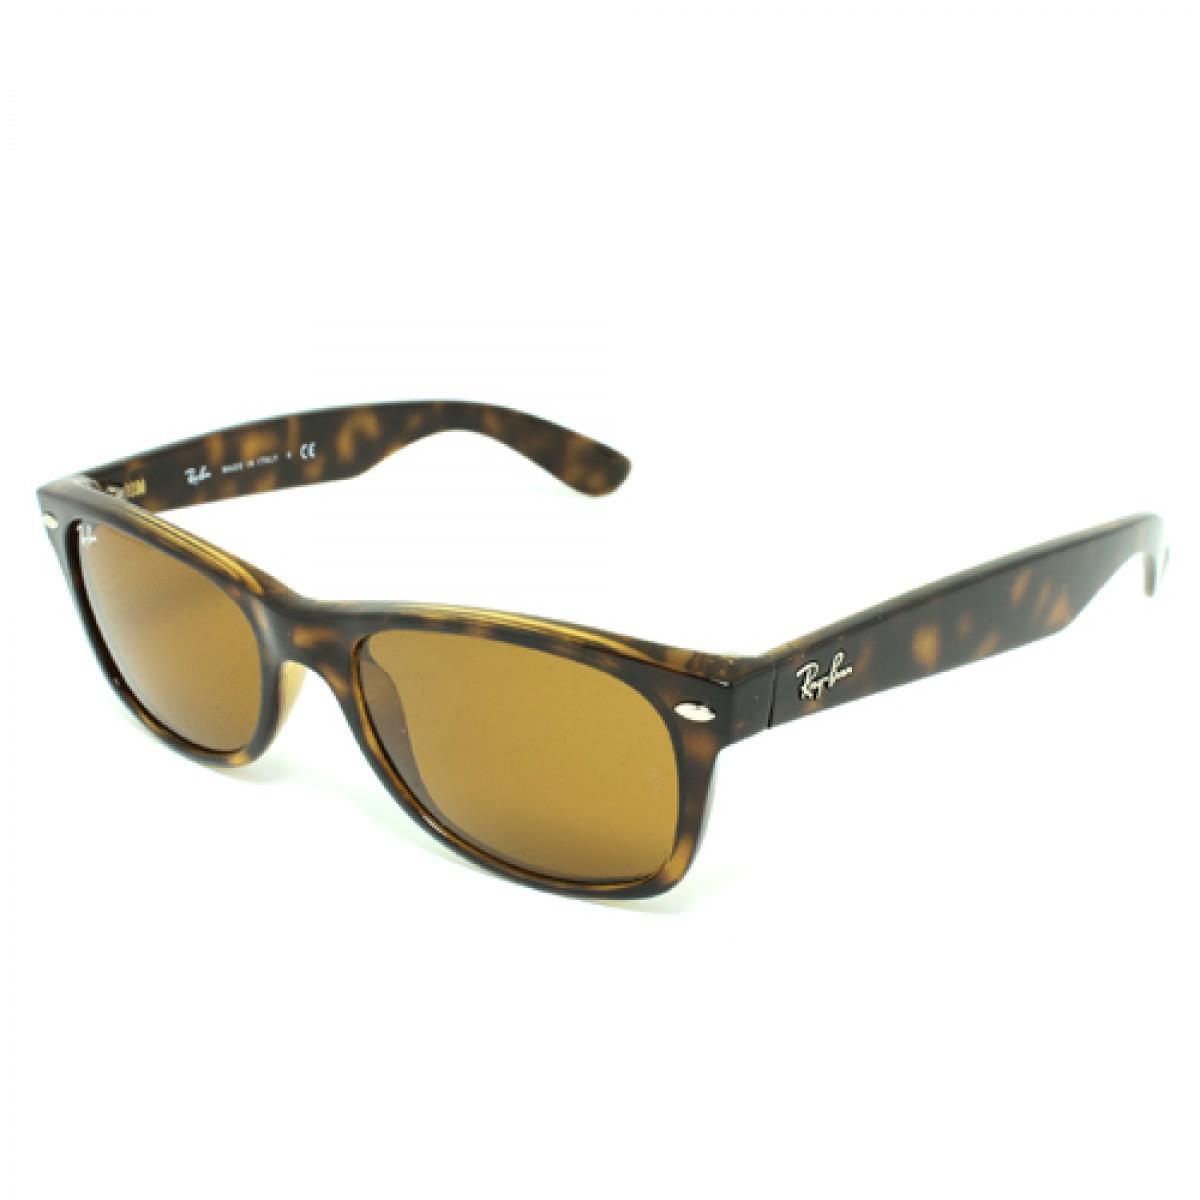 5b29a8f870523 Ray Ban New Wayfarer Unisex Sunglasses RB2132-710 51-52 - Fashion World